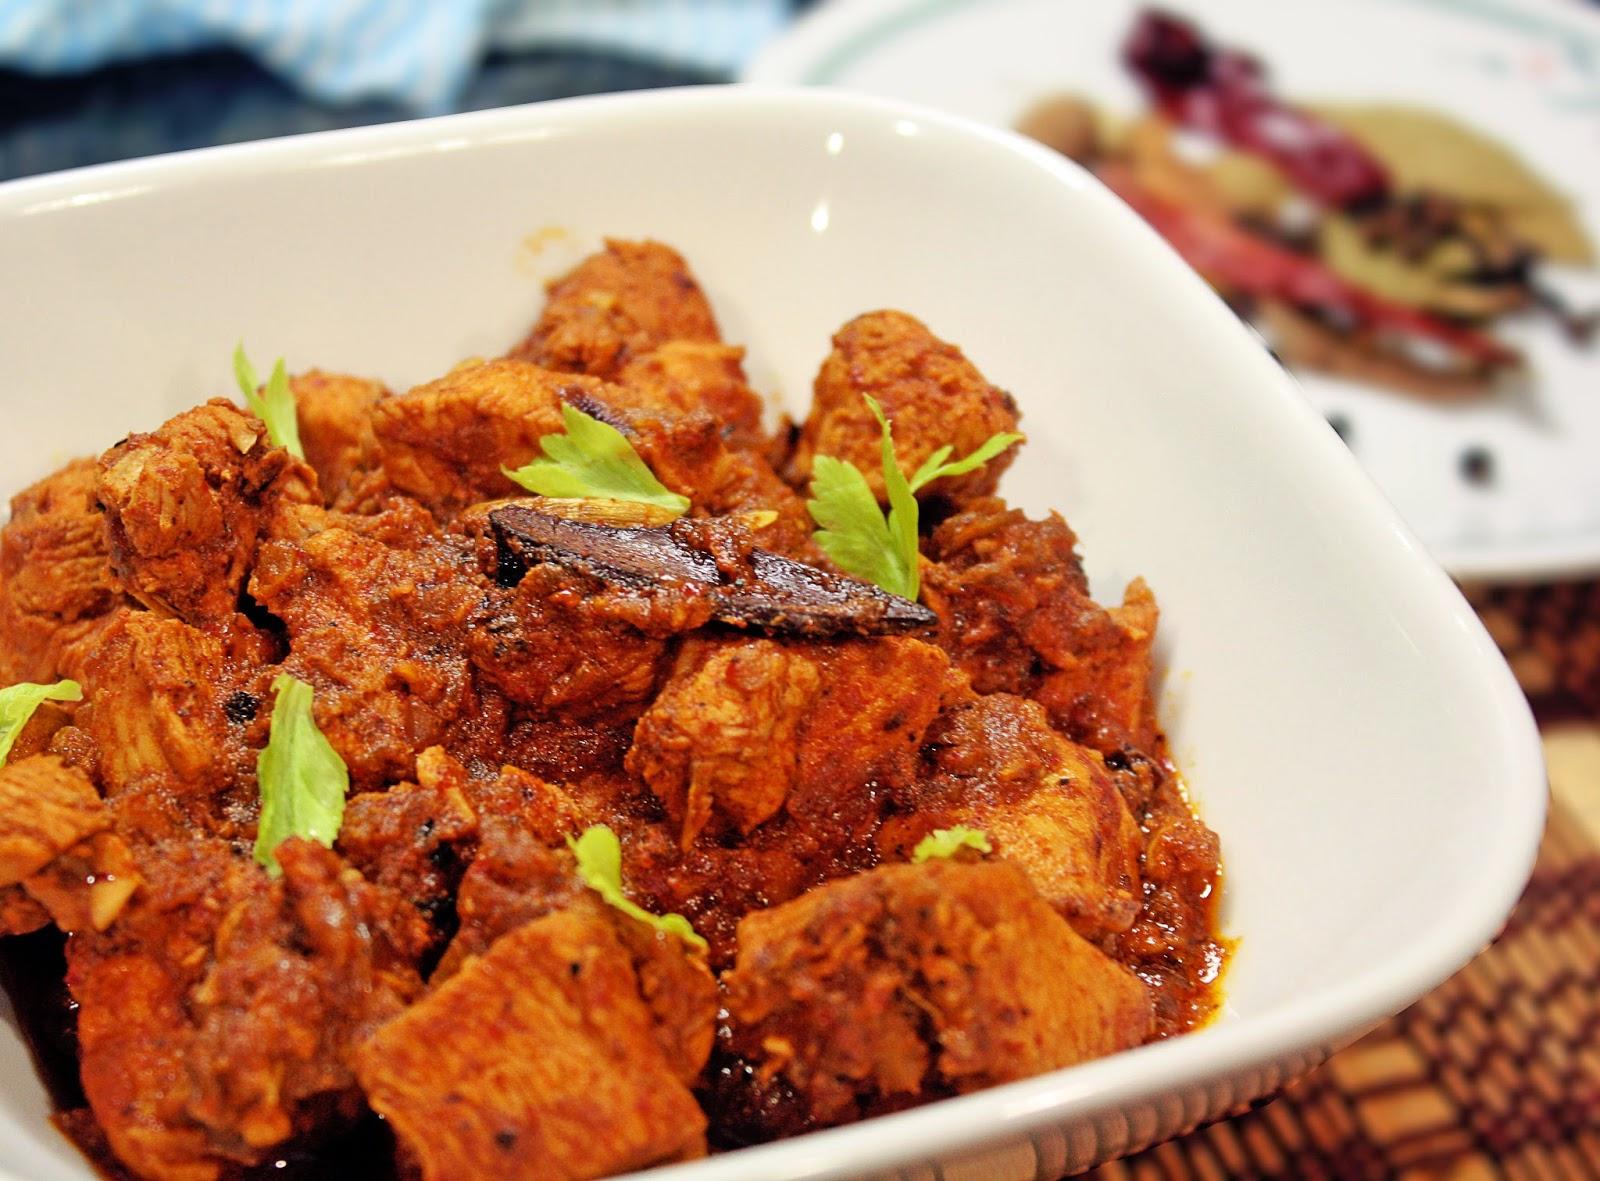 Chicken vindaloo chicken vindalho sindhooras kitchen preparation time 20 mins marination 2 hours cooking time 30 mins serves 4 6 ingredients marinade ccuart Gallery